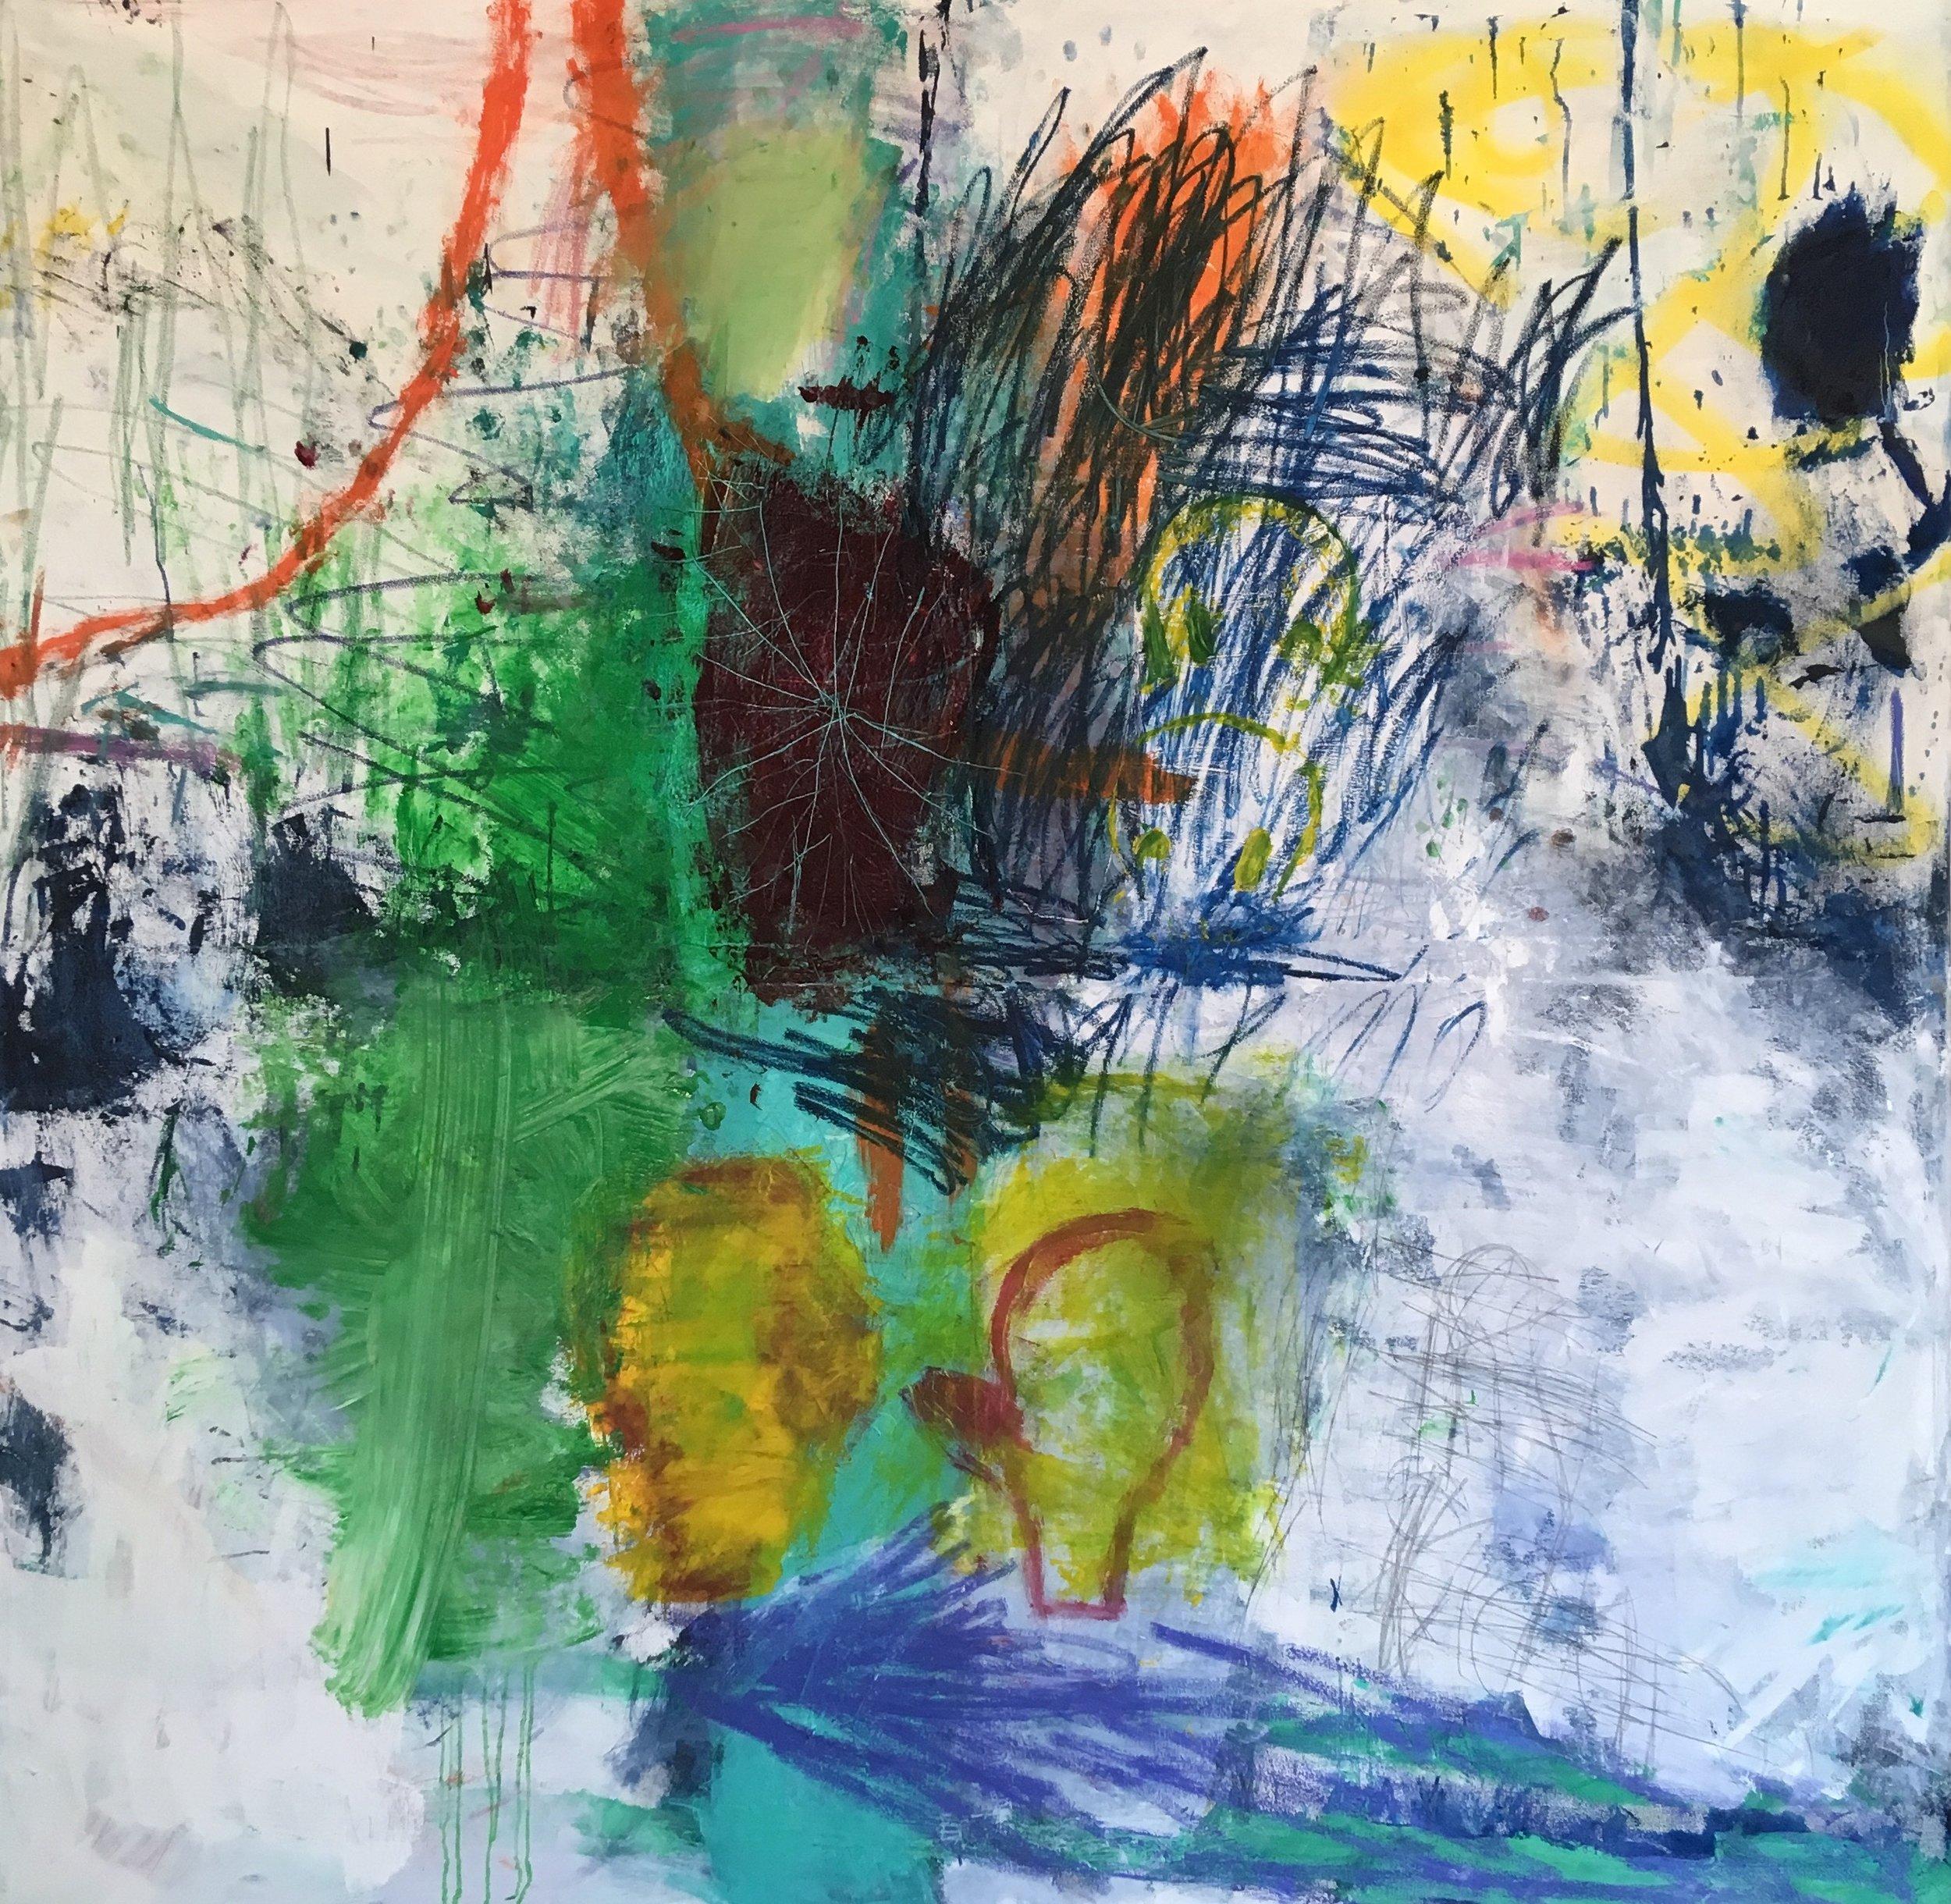 conversation 84x84 in oil, spray on canvas 2019